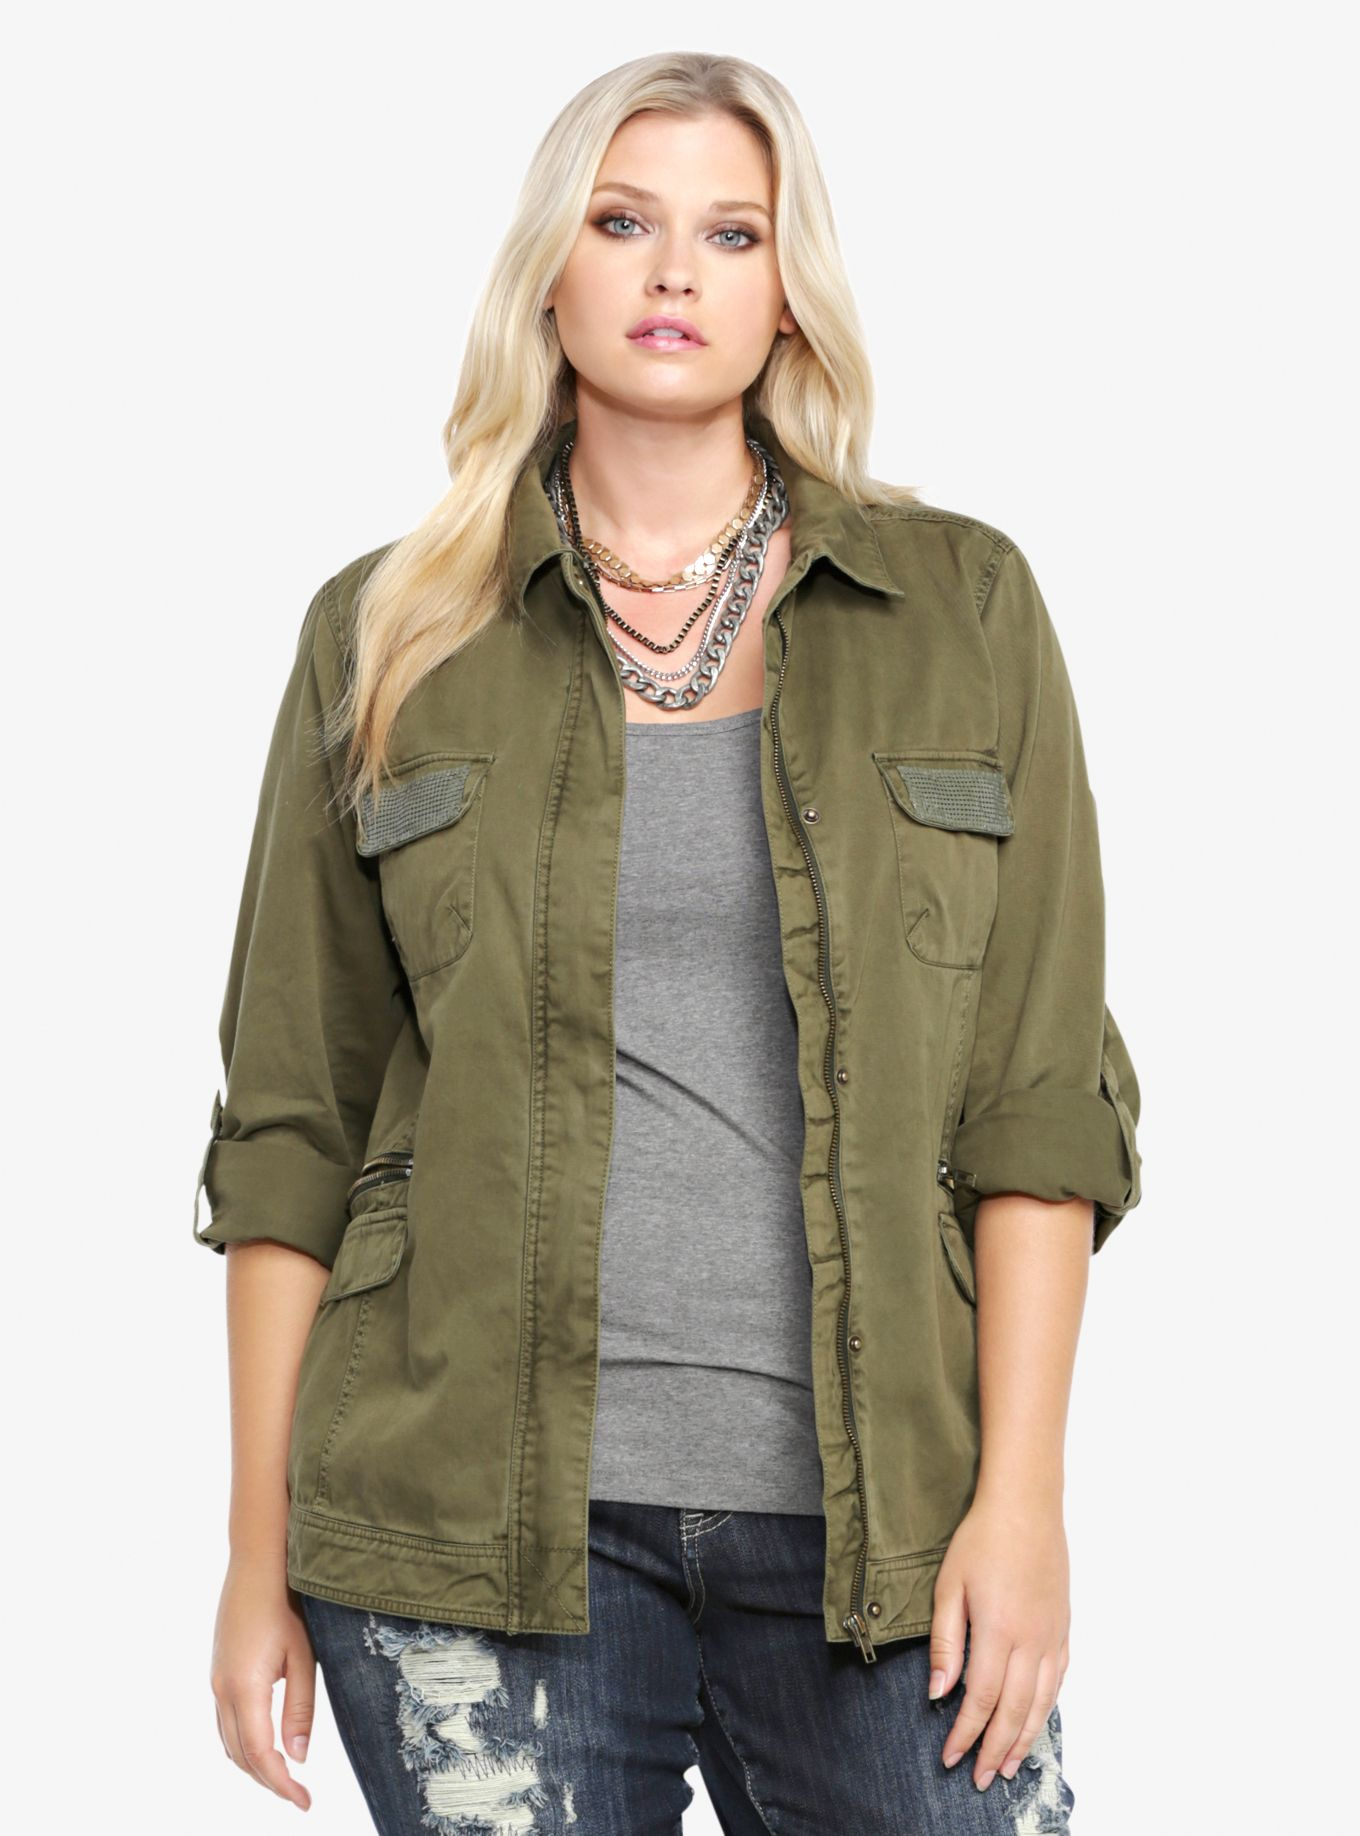 Green twill women's army jacket